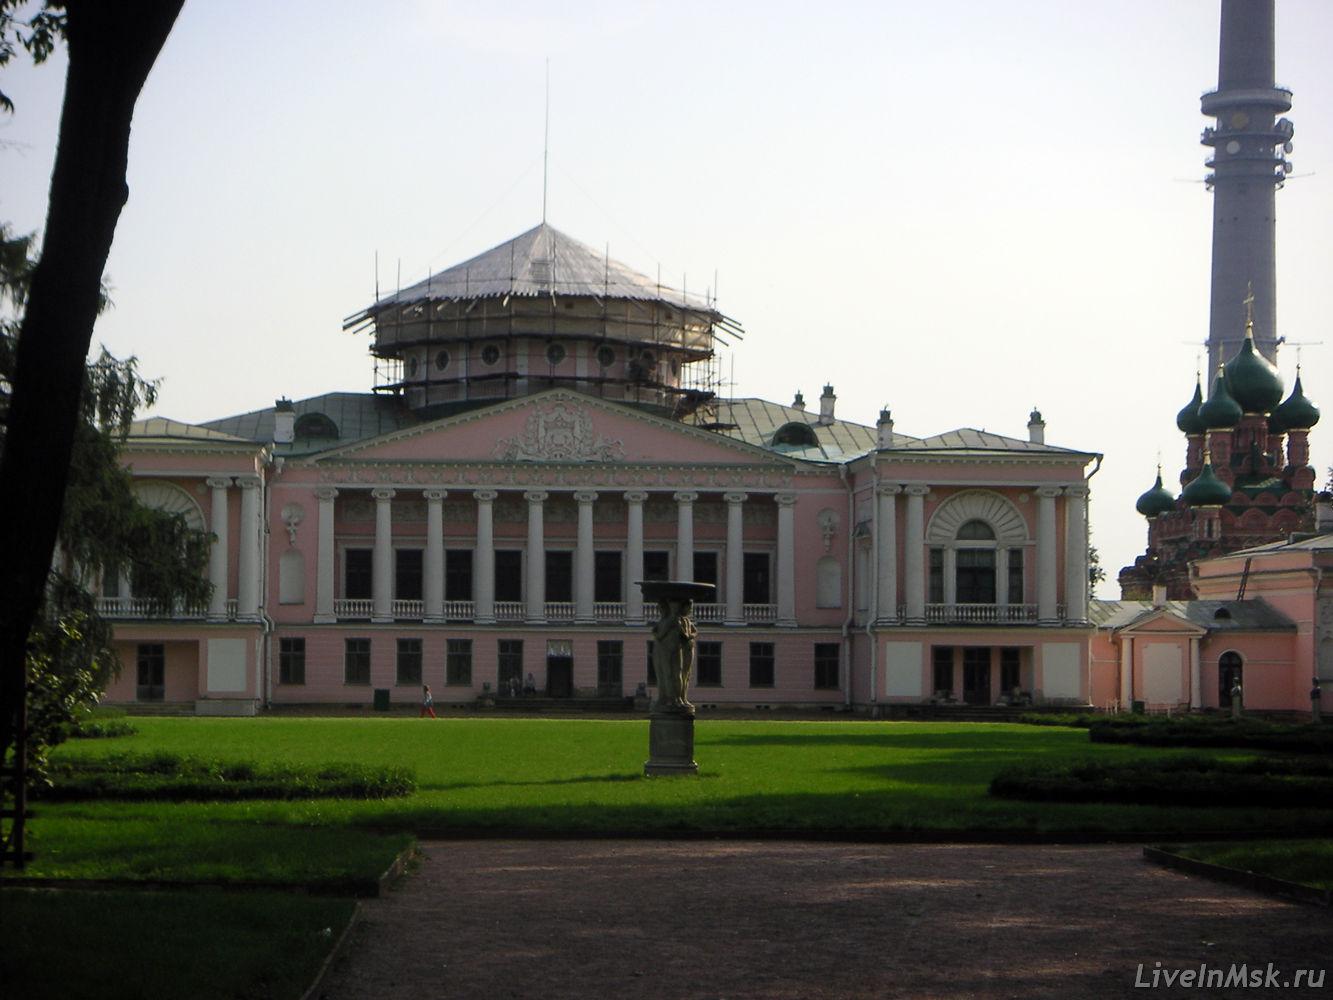 Останкинский дворец, фото 2012 года